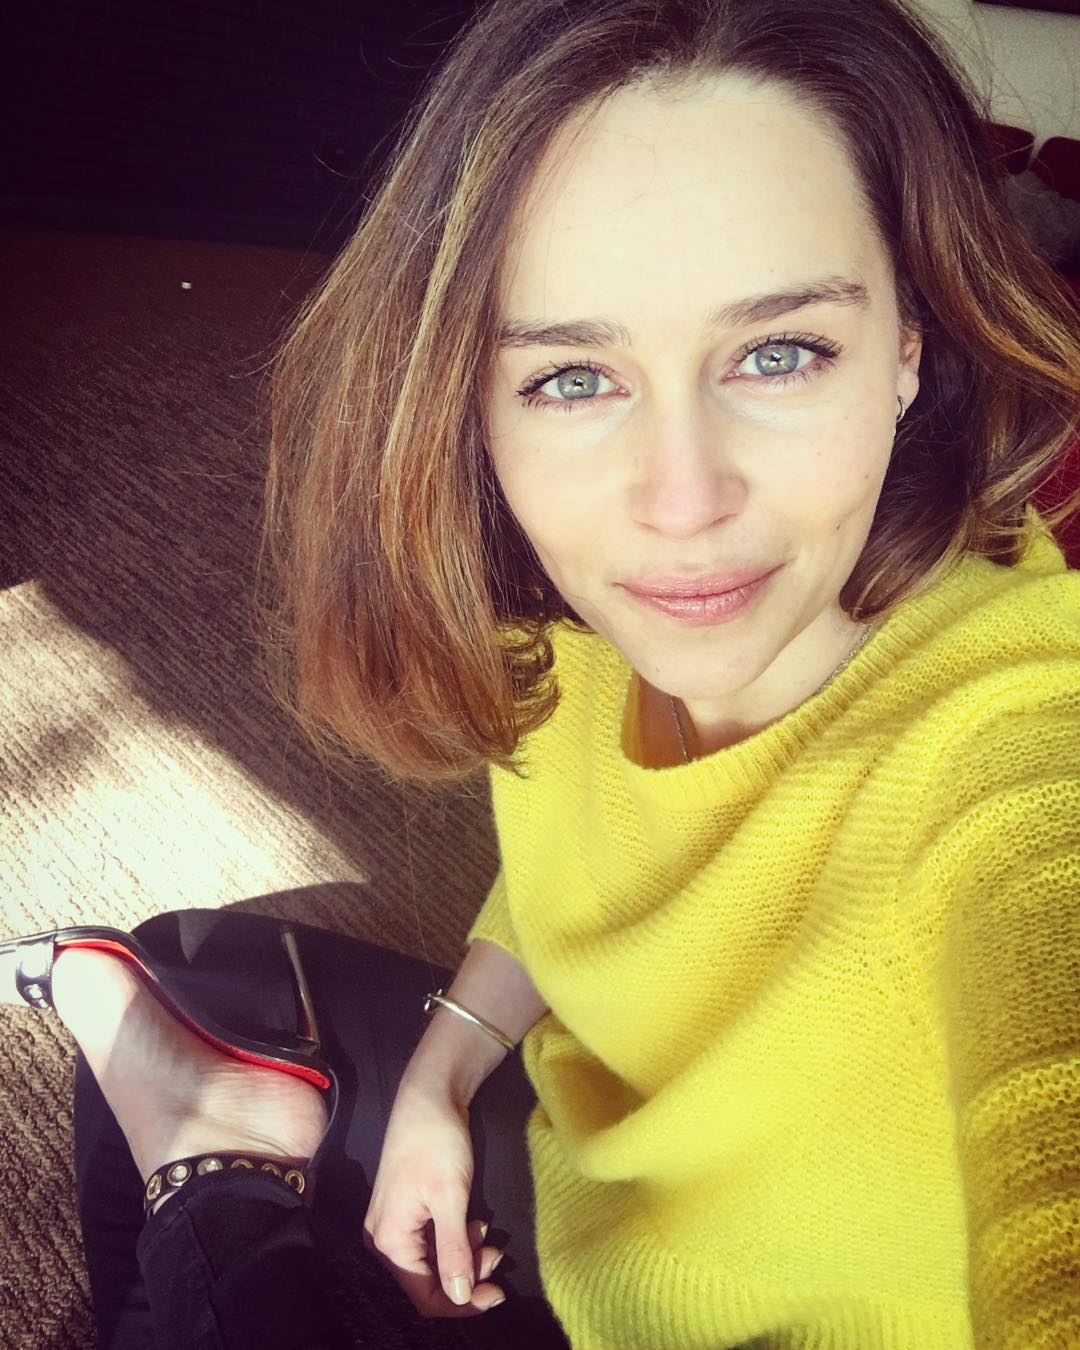 Emilia-Clarke-Wallpapers-Insta-Fit-Bio-6